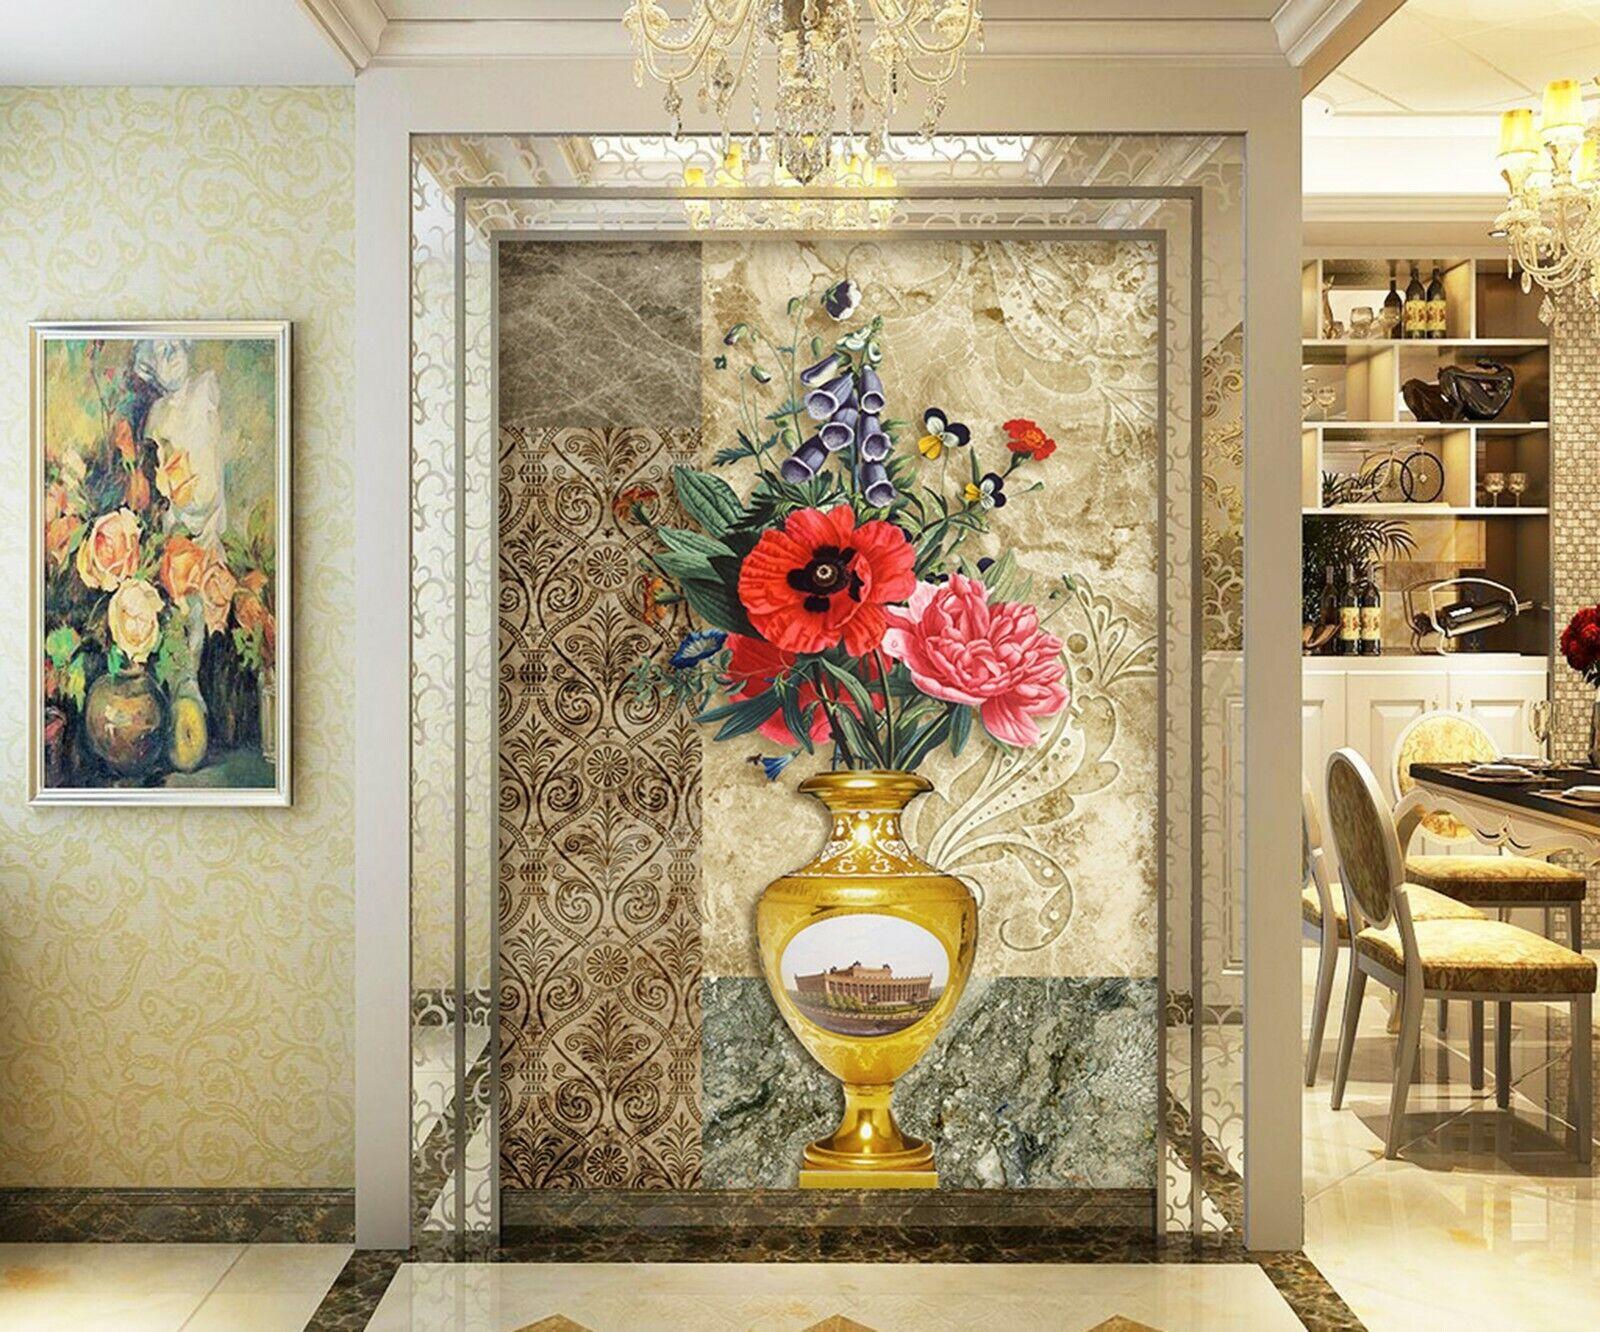 3D Flowers Vase I302 Wallpaper Mural Sefl-adhesive Removable Sticker Kid Wendy